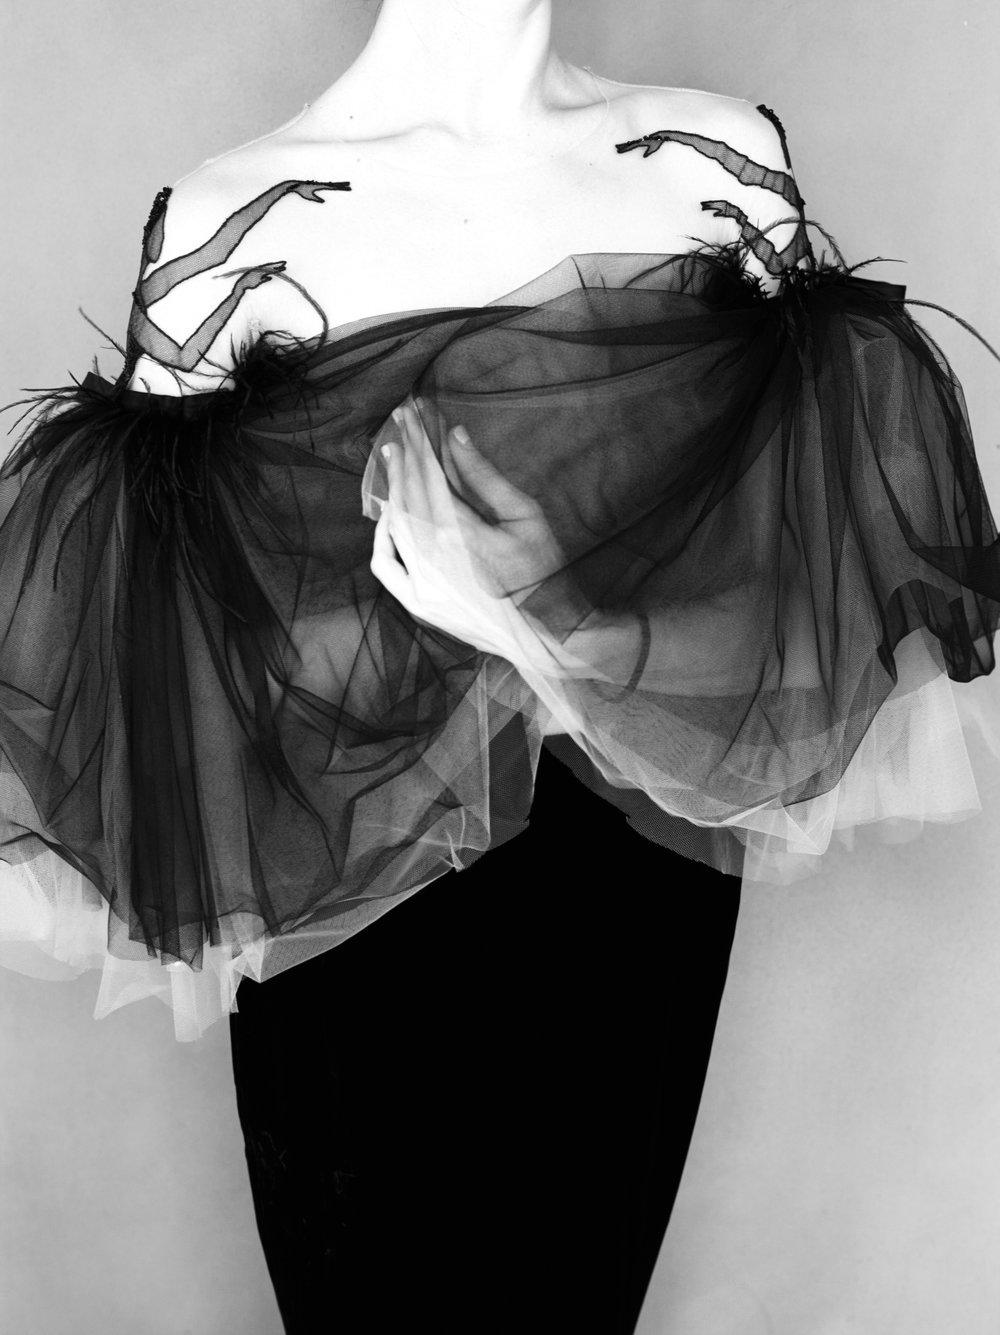 W_16_IX_Ballerinas_0003.jpg